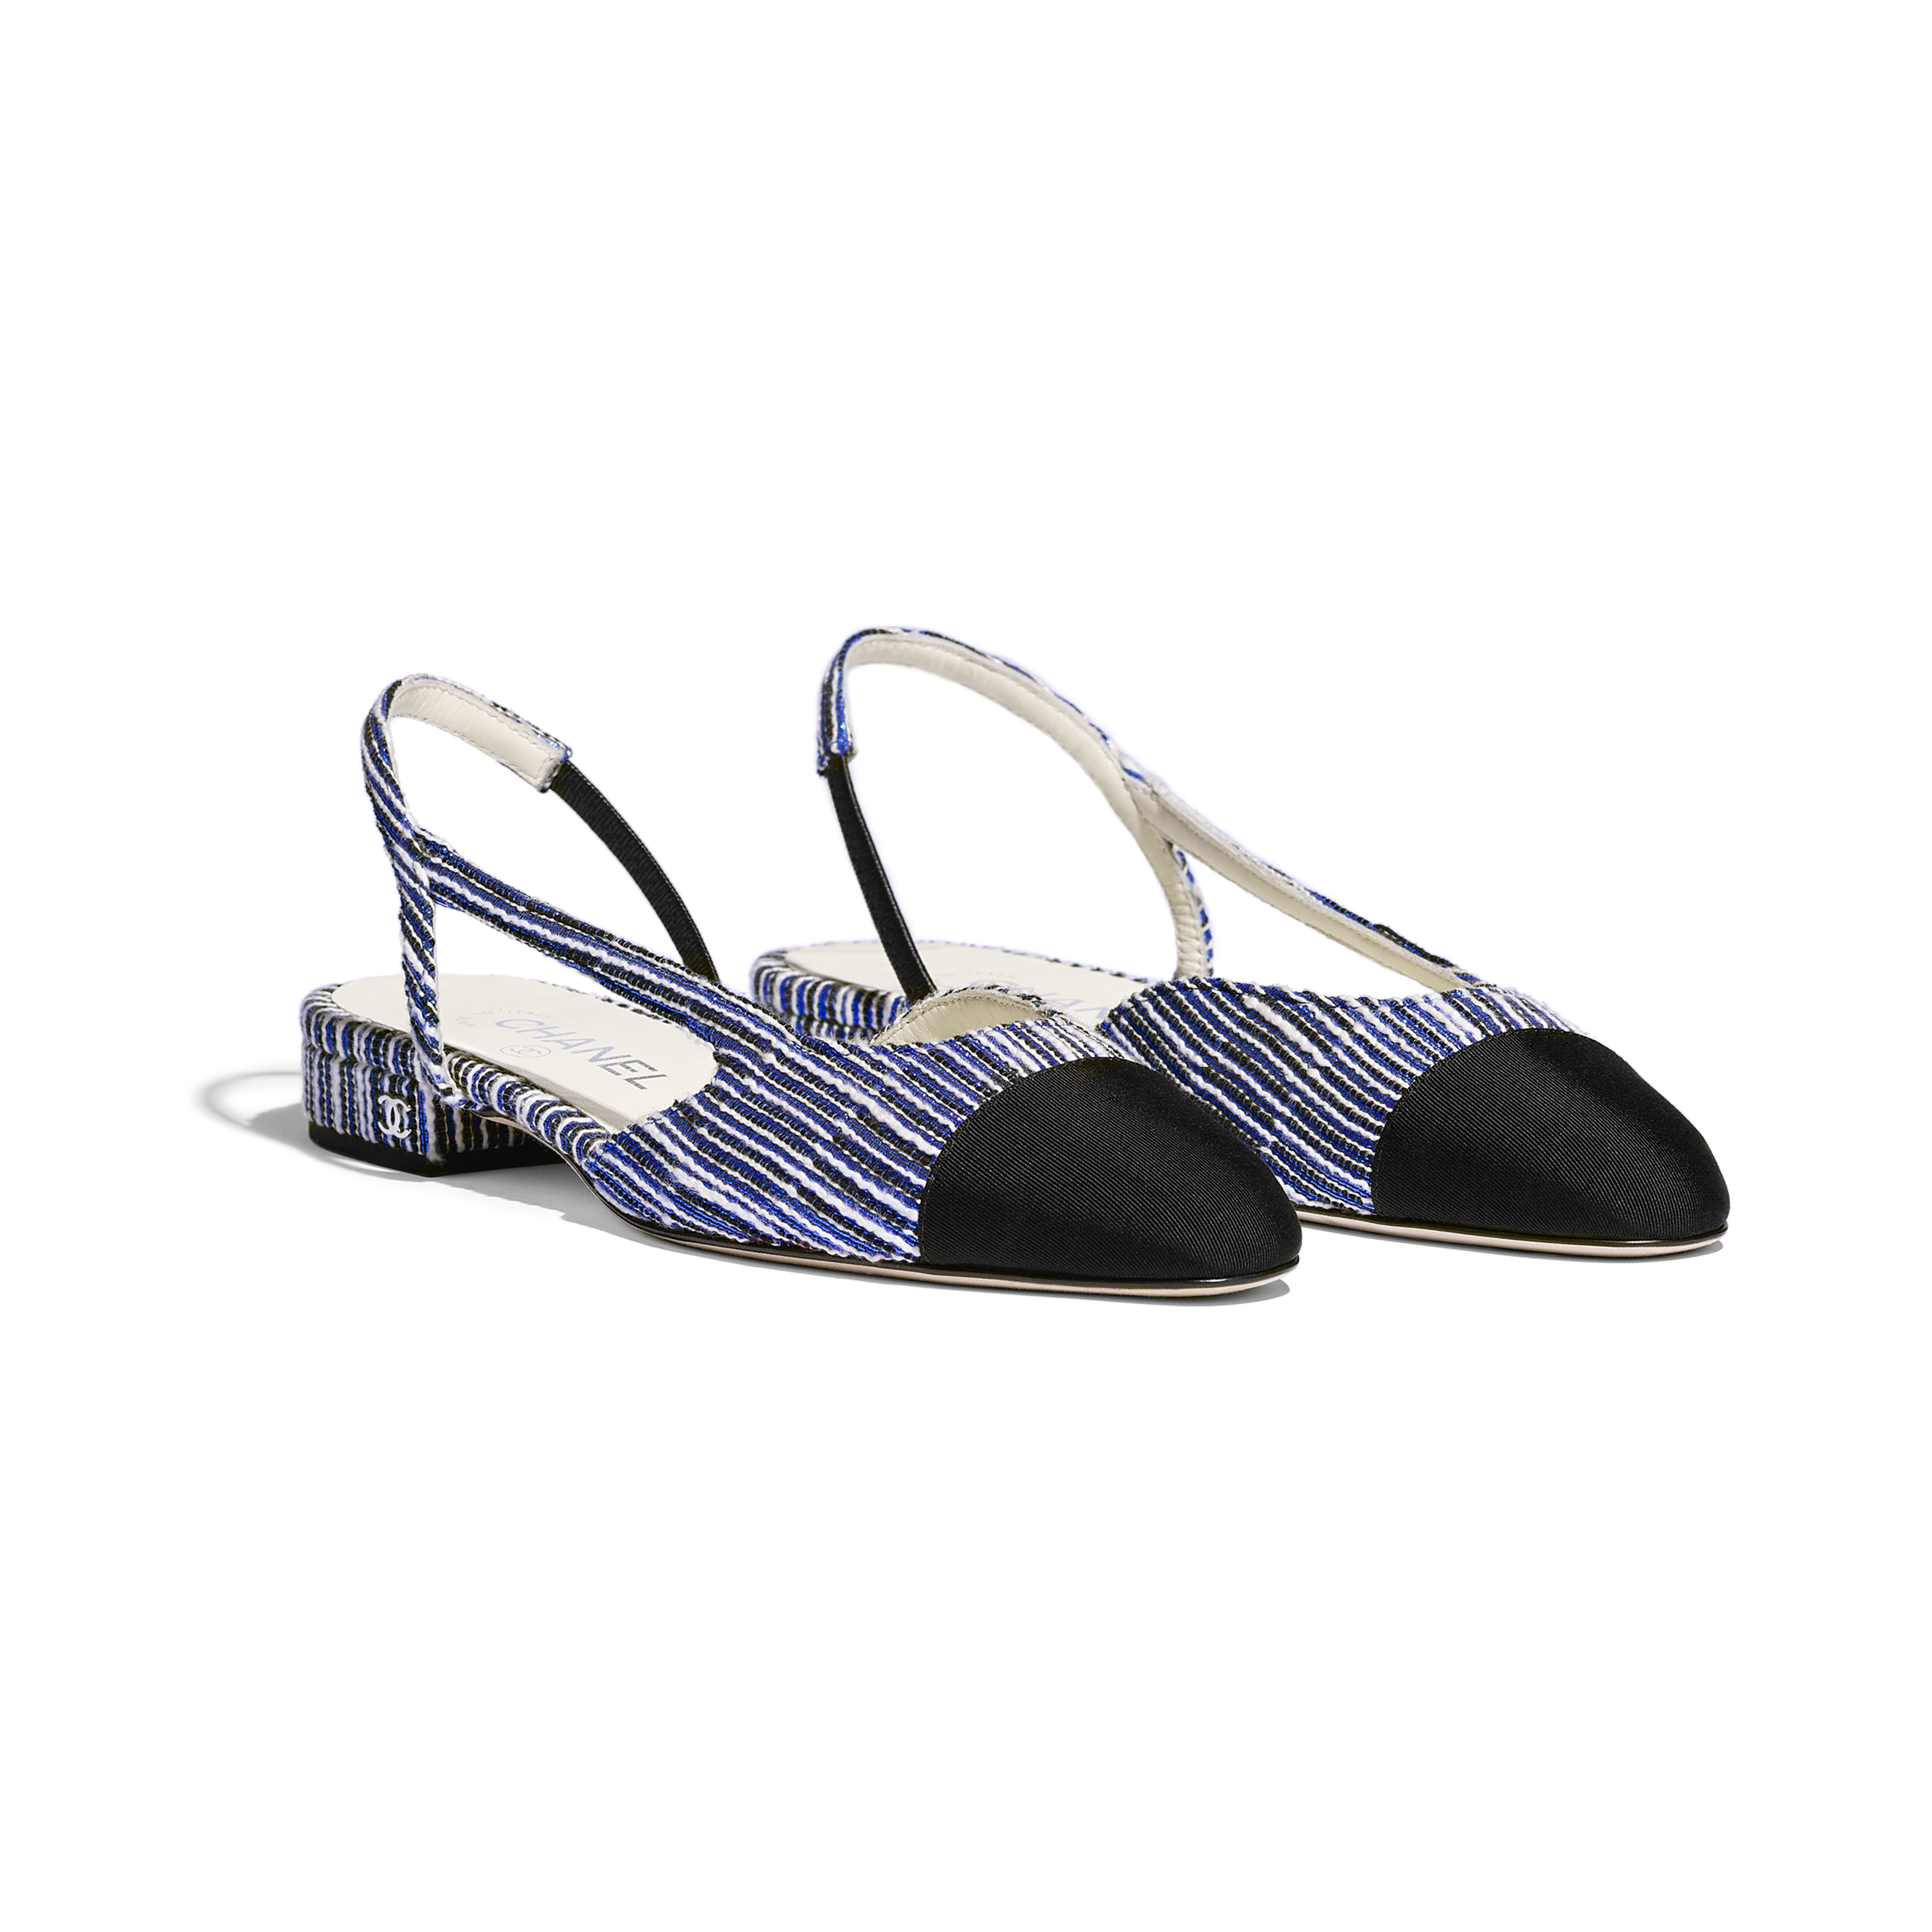 Slingbacks - White, Blue, Silver & Black - Tweed & Grosgrain - Alternative view - see full sized version